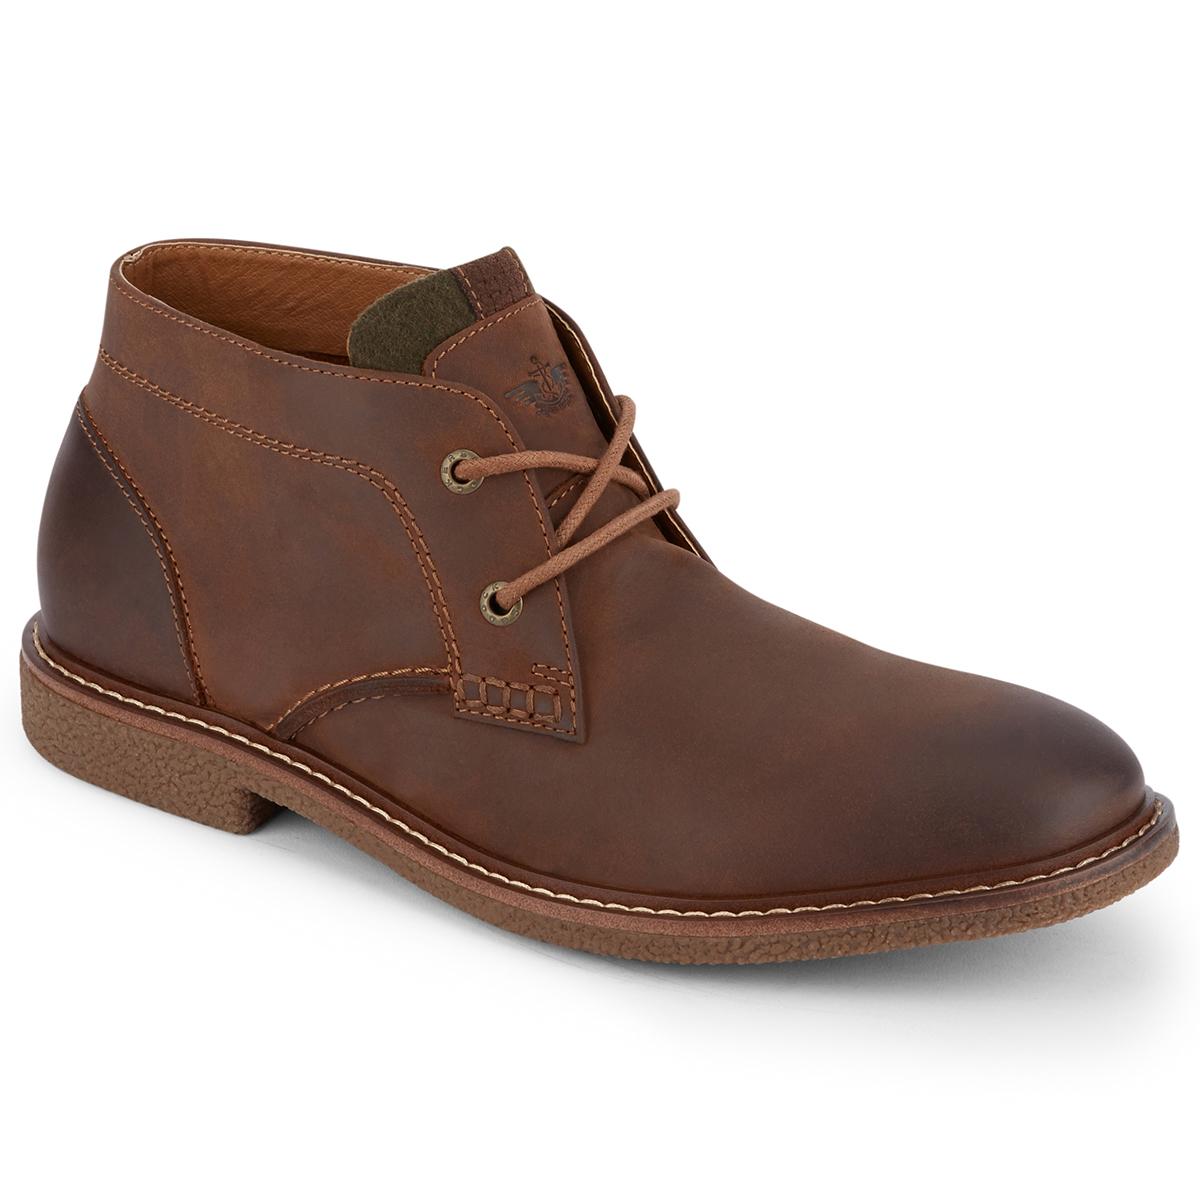 Dockers Men's Greyson 2 Eye Chukka Boots